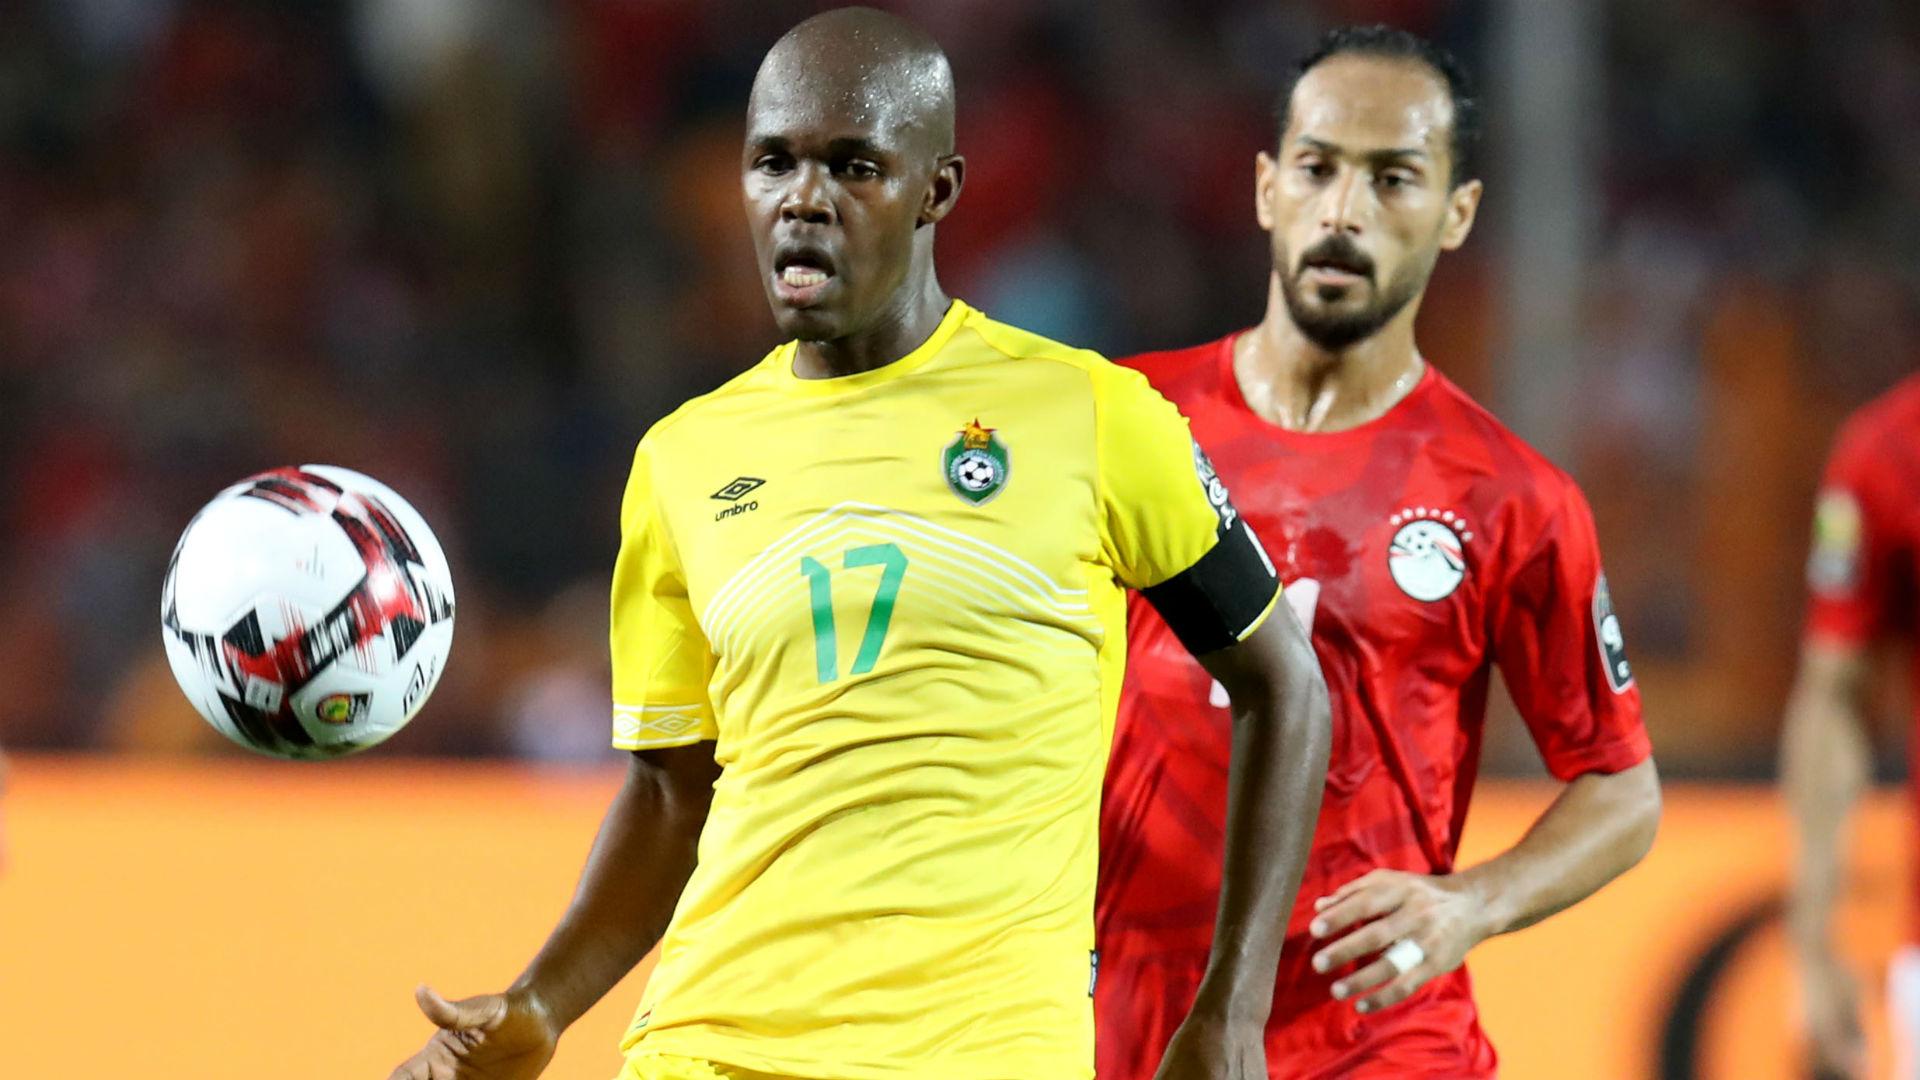 Musona: KAS Eupen currently in talks with Mamelodi Sundowns target